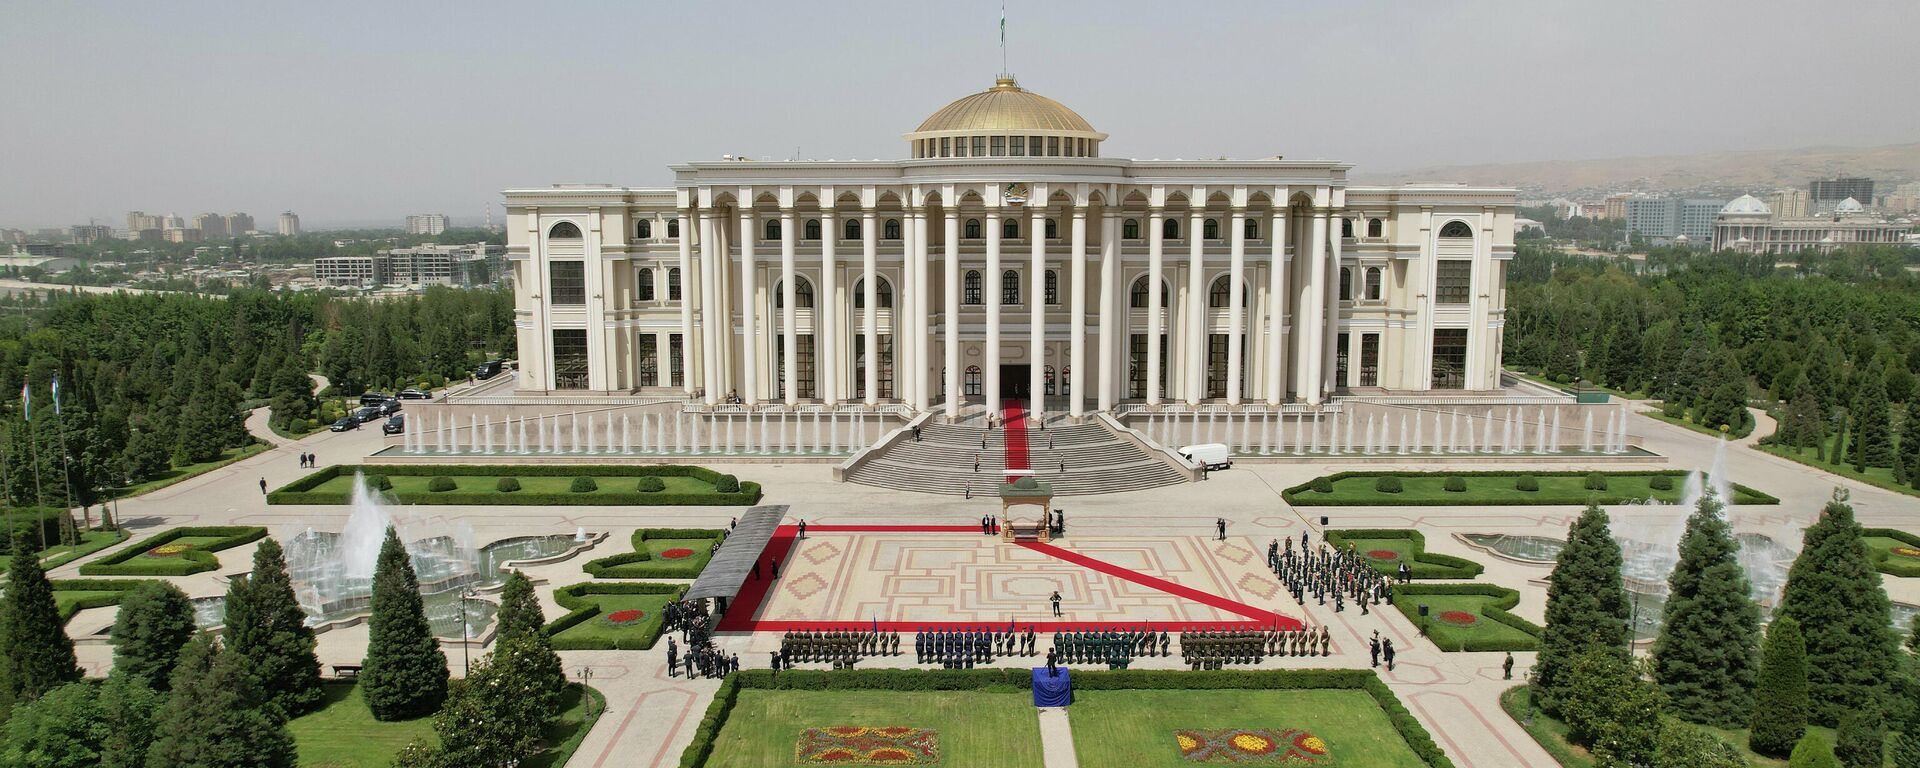 Дворец Нации в Душанбе - Sputnik Тоҷикистон, 1920, 31.08.2021